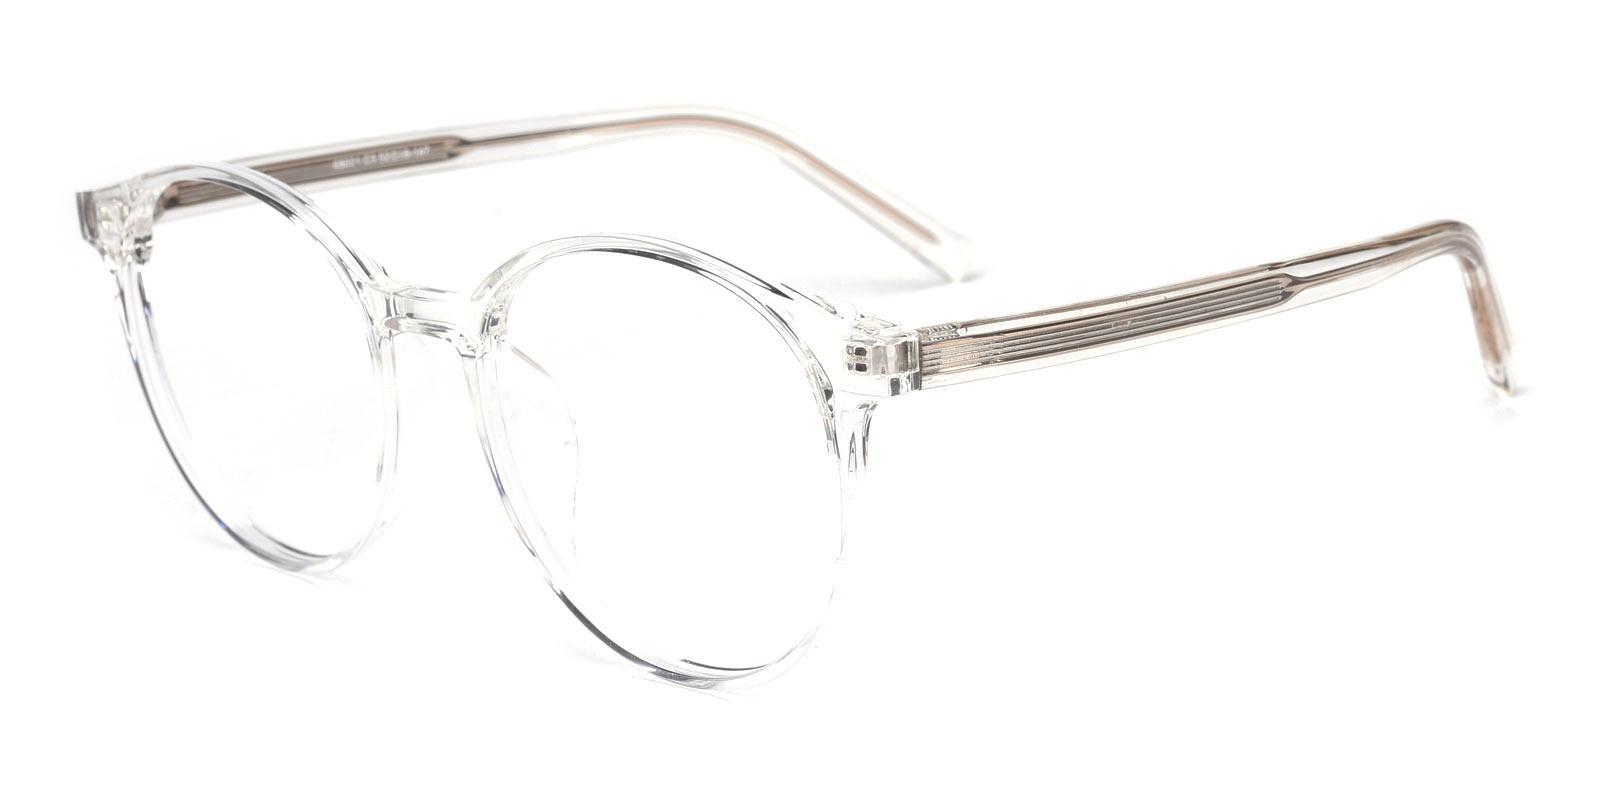 Bubbletea-Translucent-Round-TR-Eyeglasses-detail